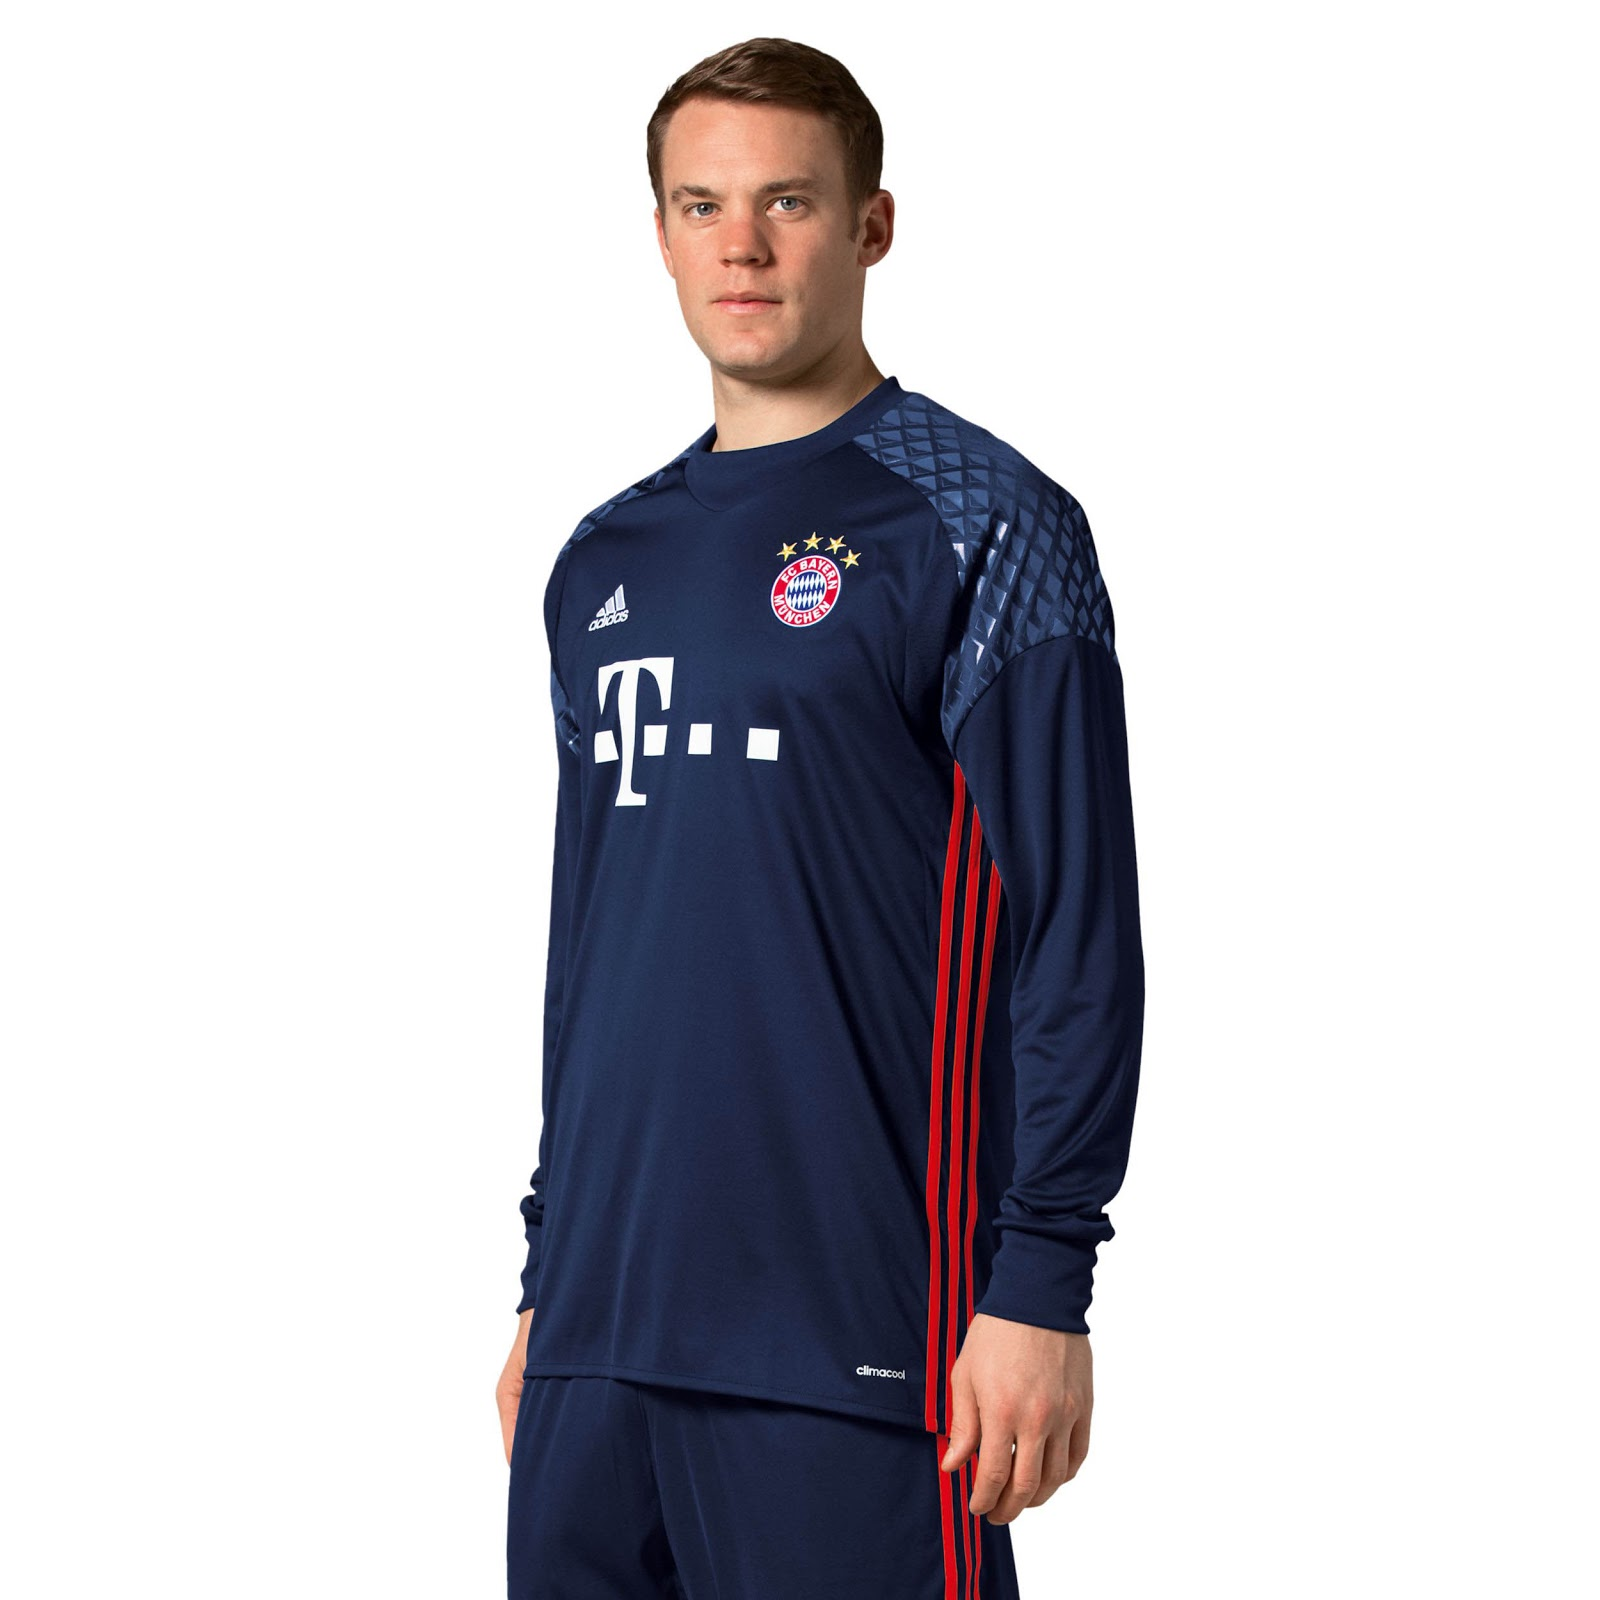 quality design 99e20 4d95f neuer bayern munich jersey